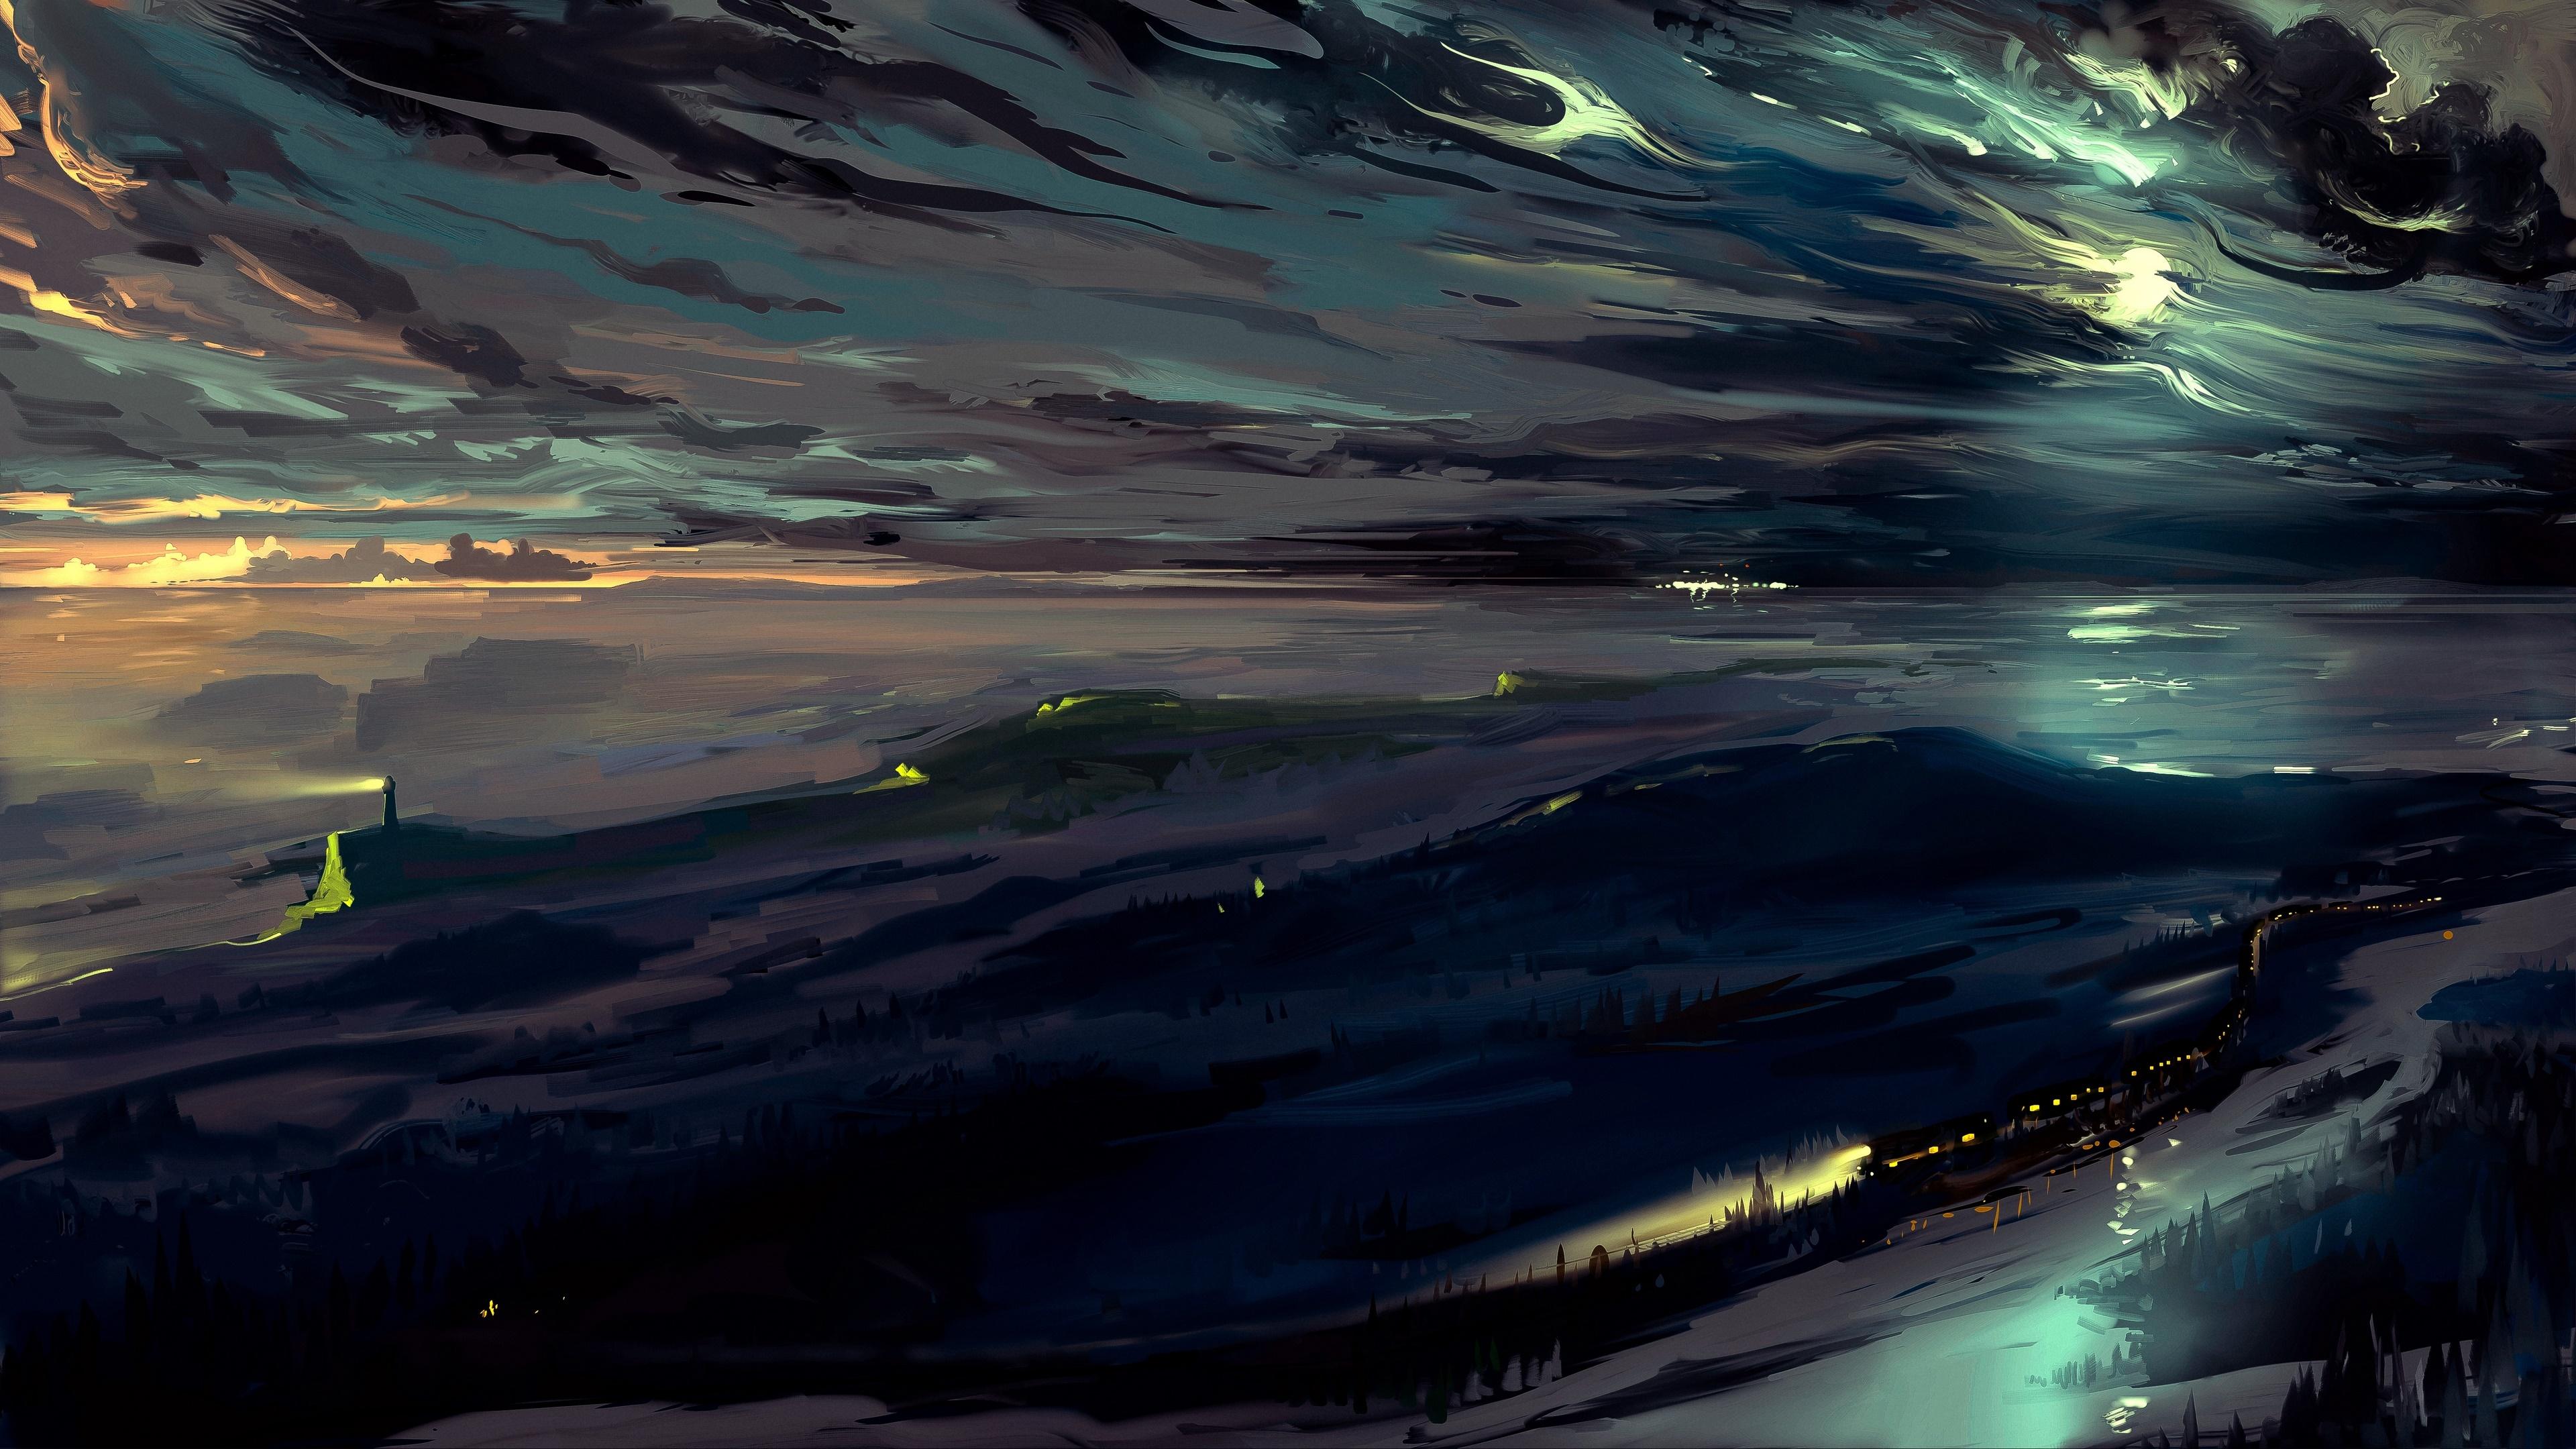 Winter night painting art wallpaper